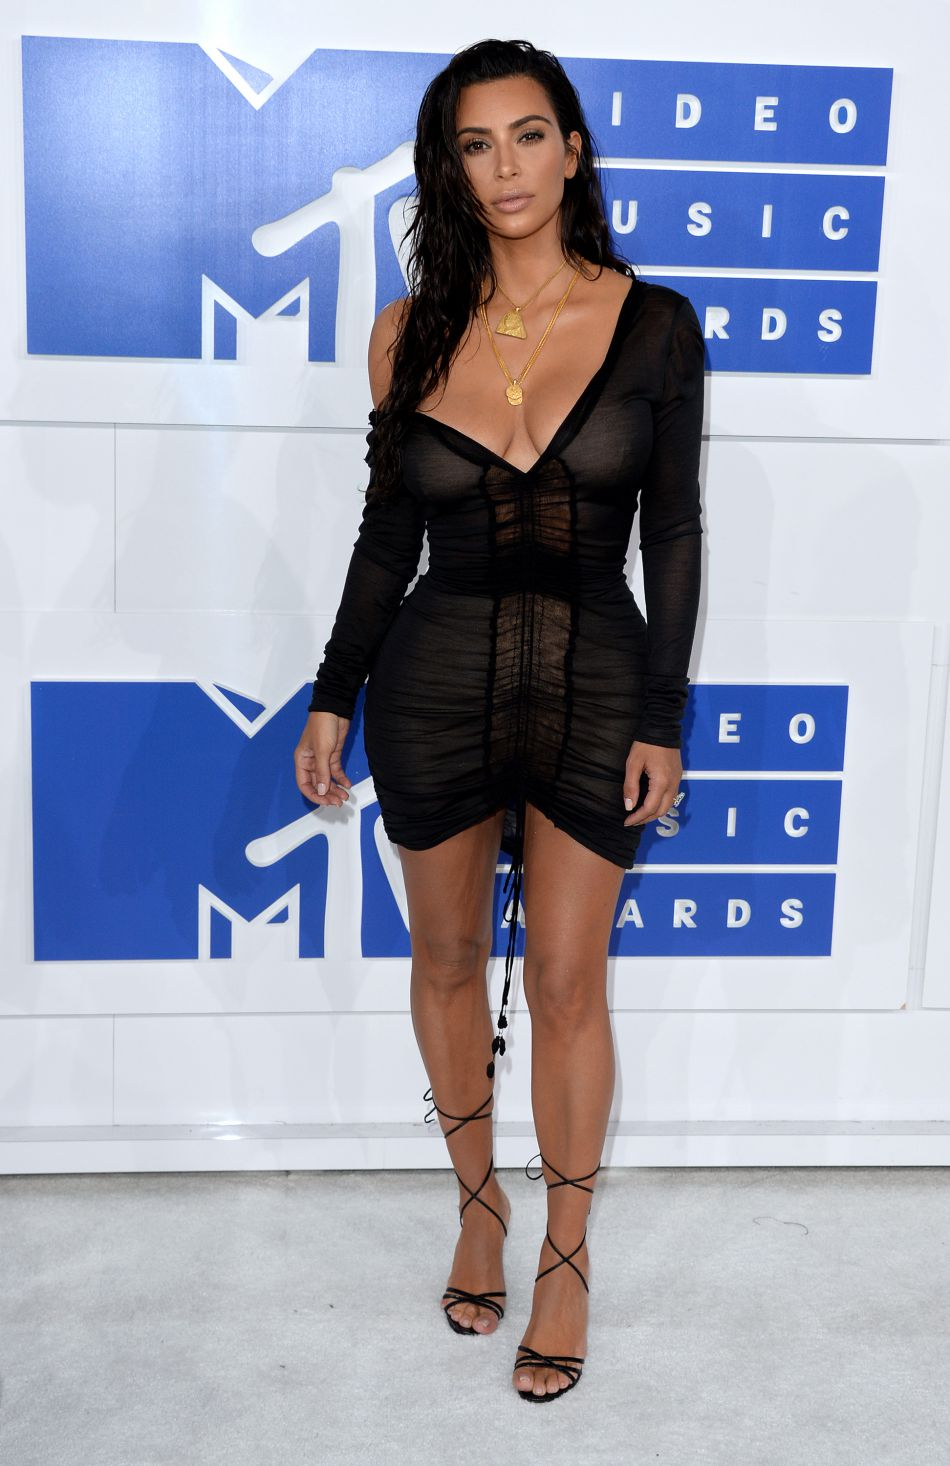 En robe noire transparente, Kim Kardashian est toujours aussi sexy.